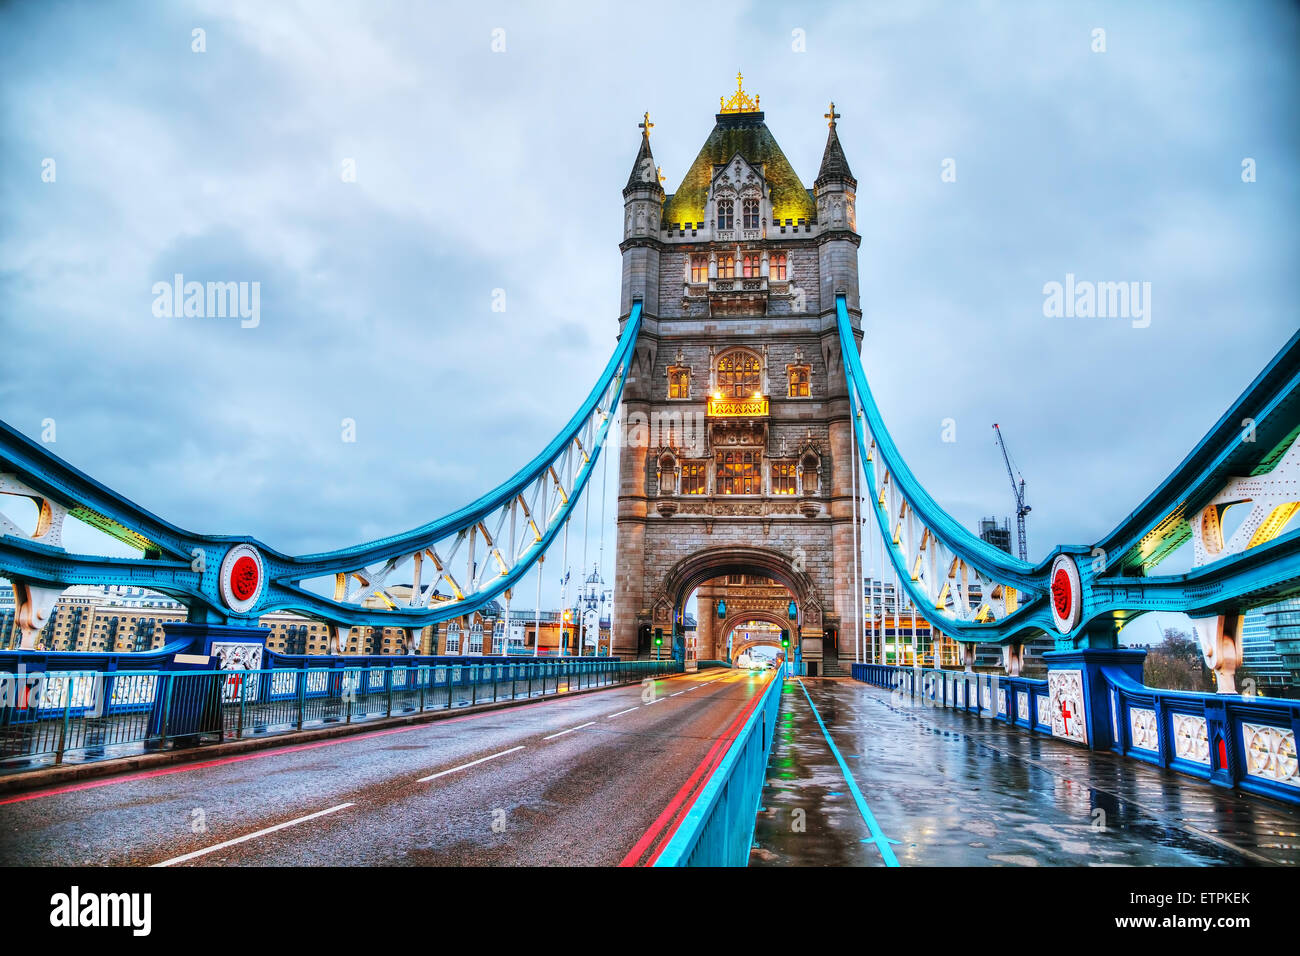 Tower Bridge à Londres, Grande Bretagne le matin Photo Stock